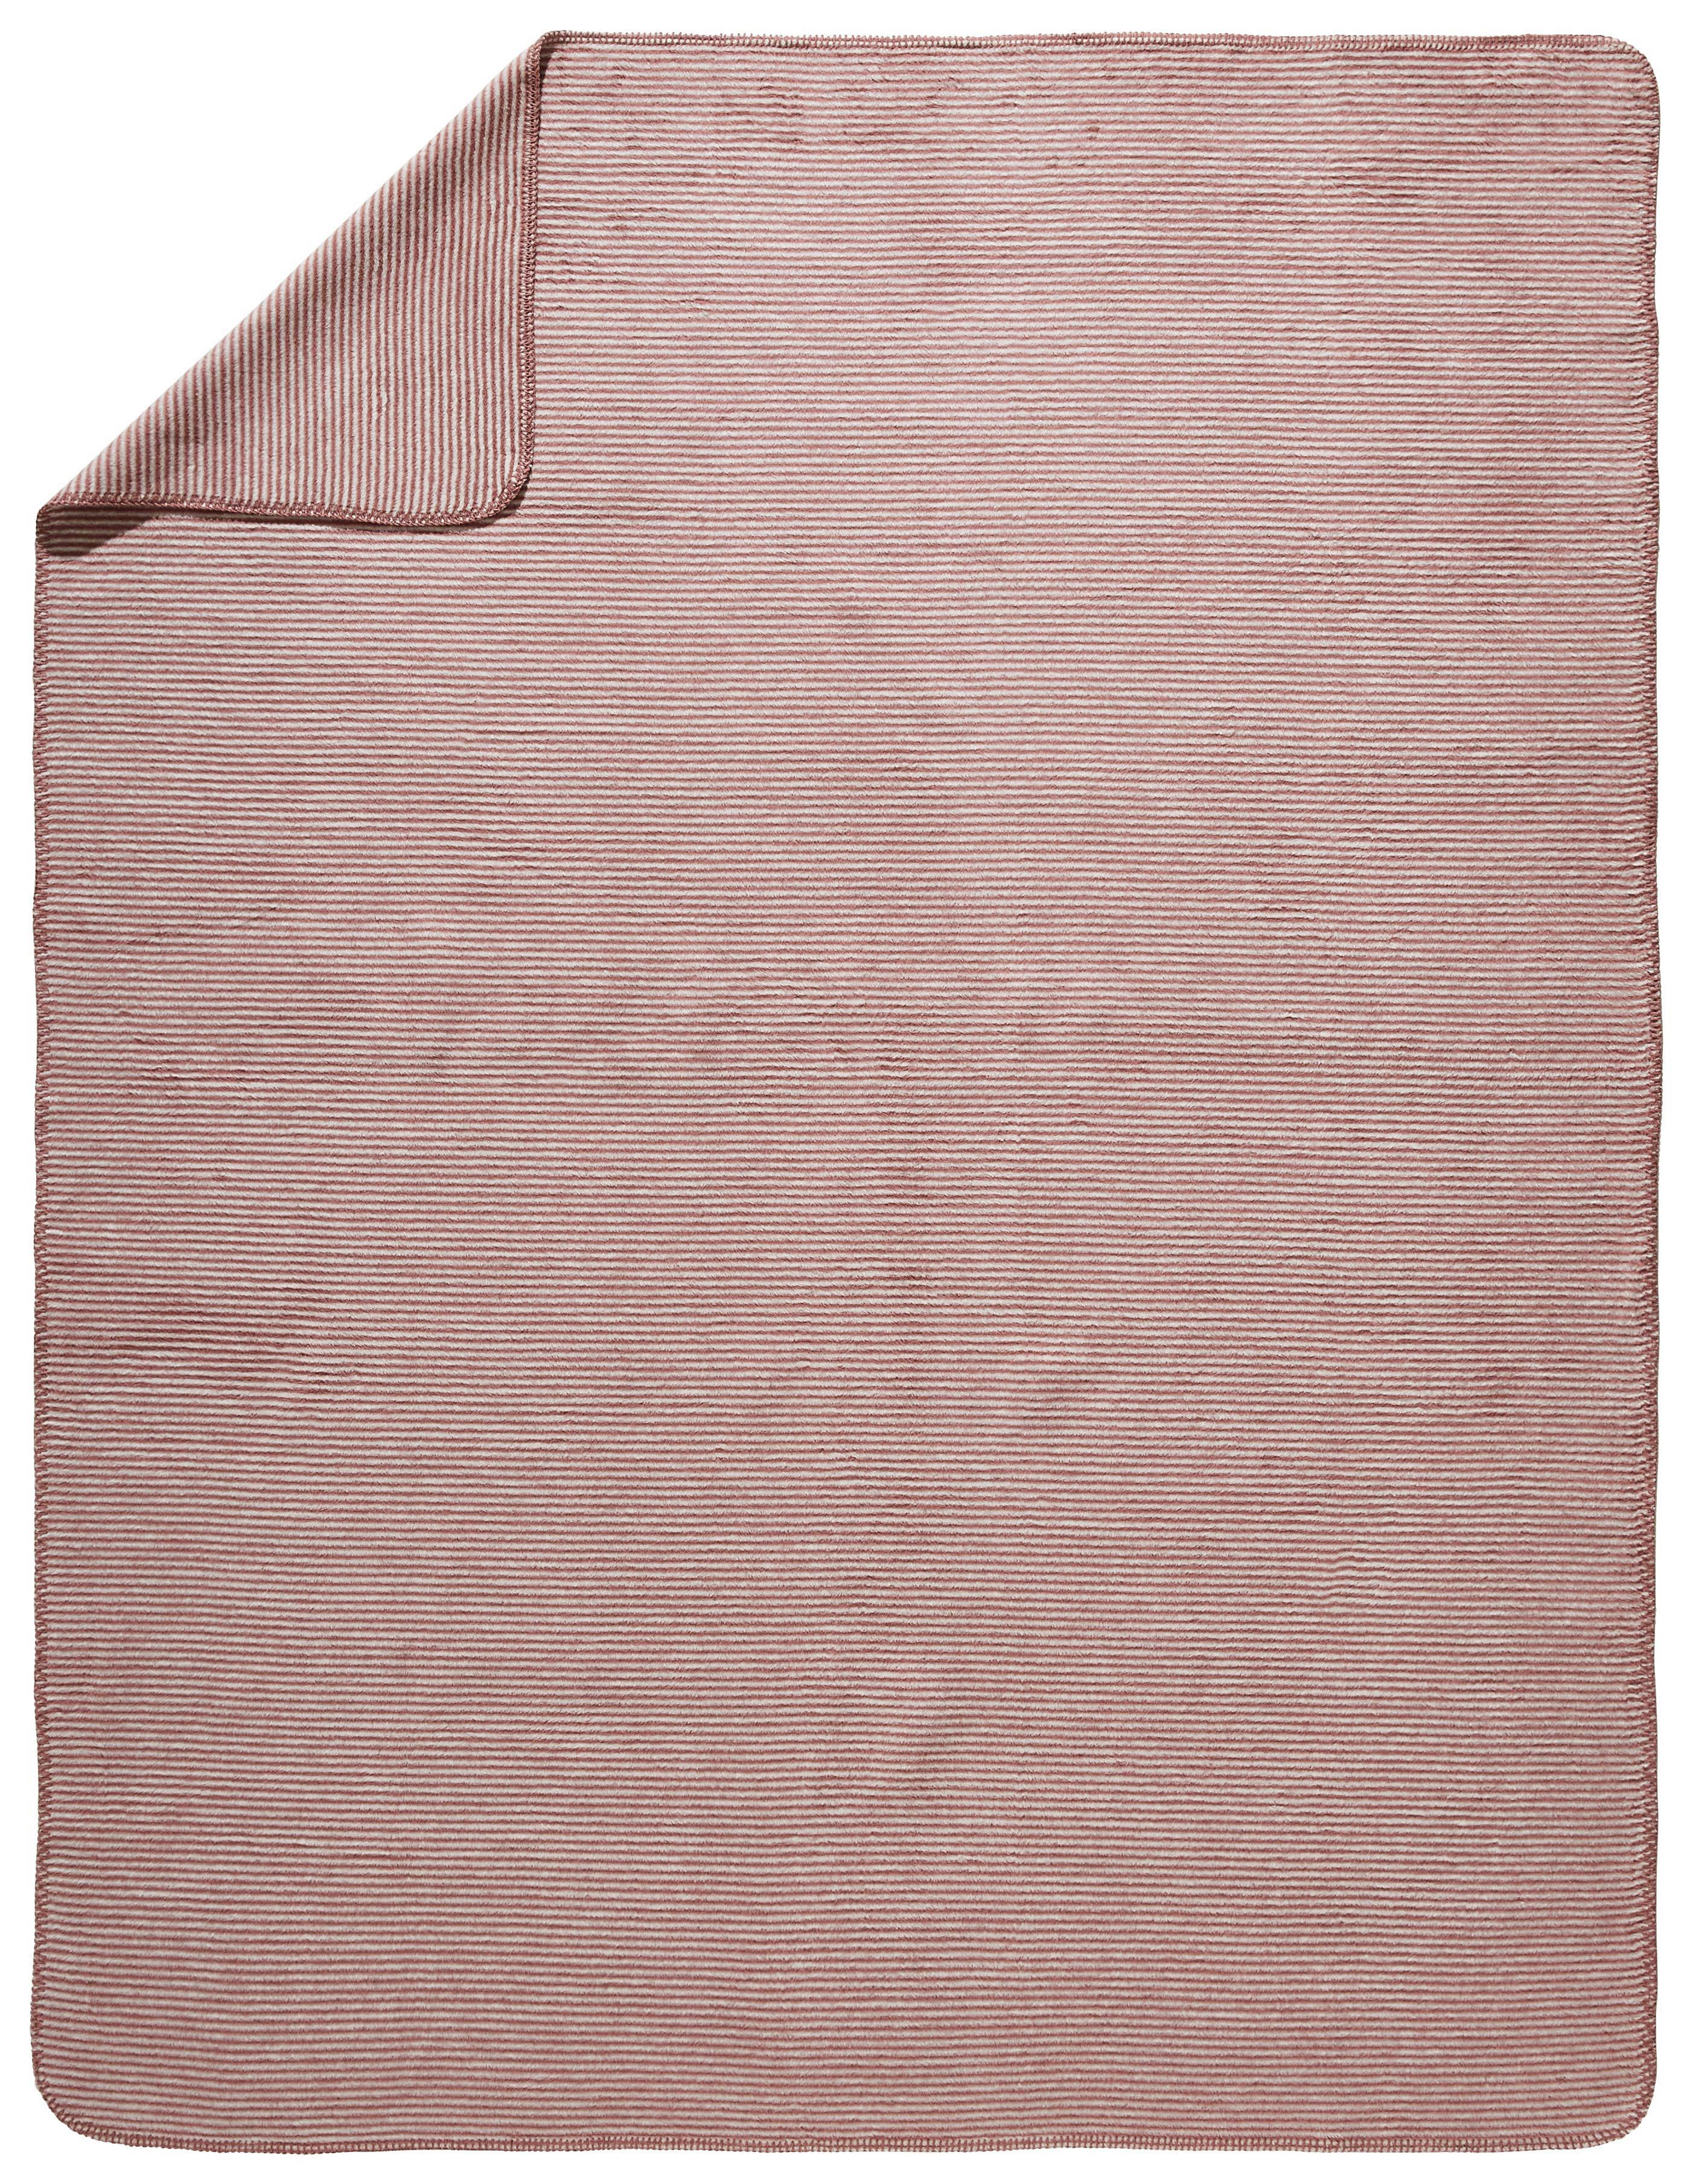 DEKA - boje srebra/smeđa, Basics, tekstil (150/200/cm) - Novel